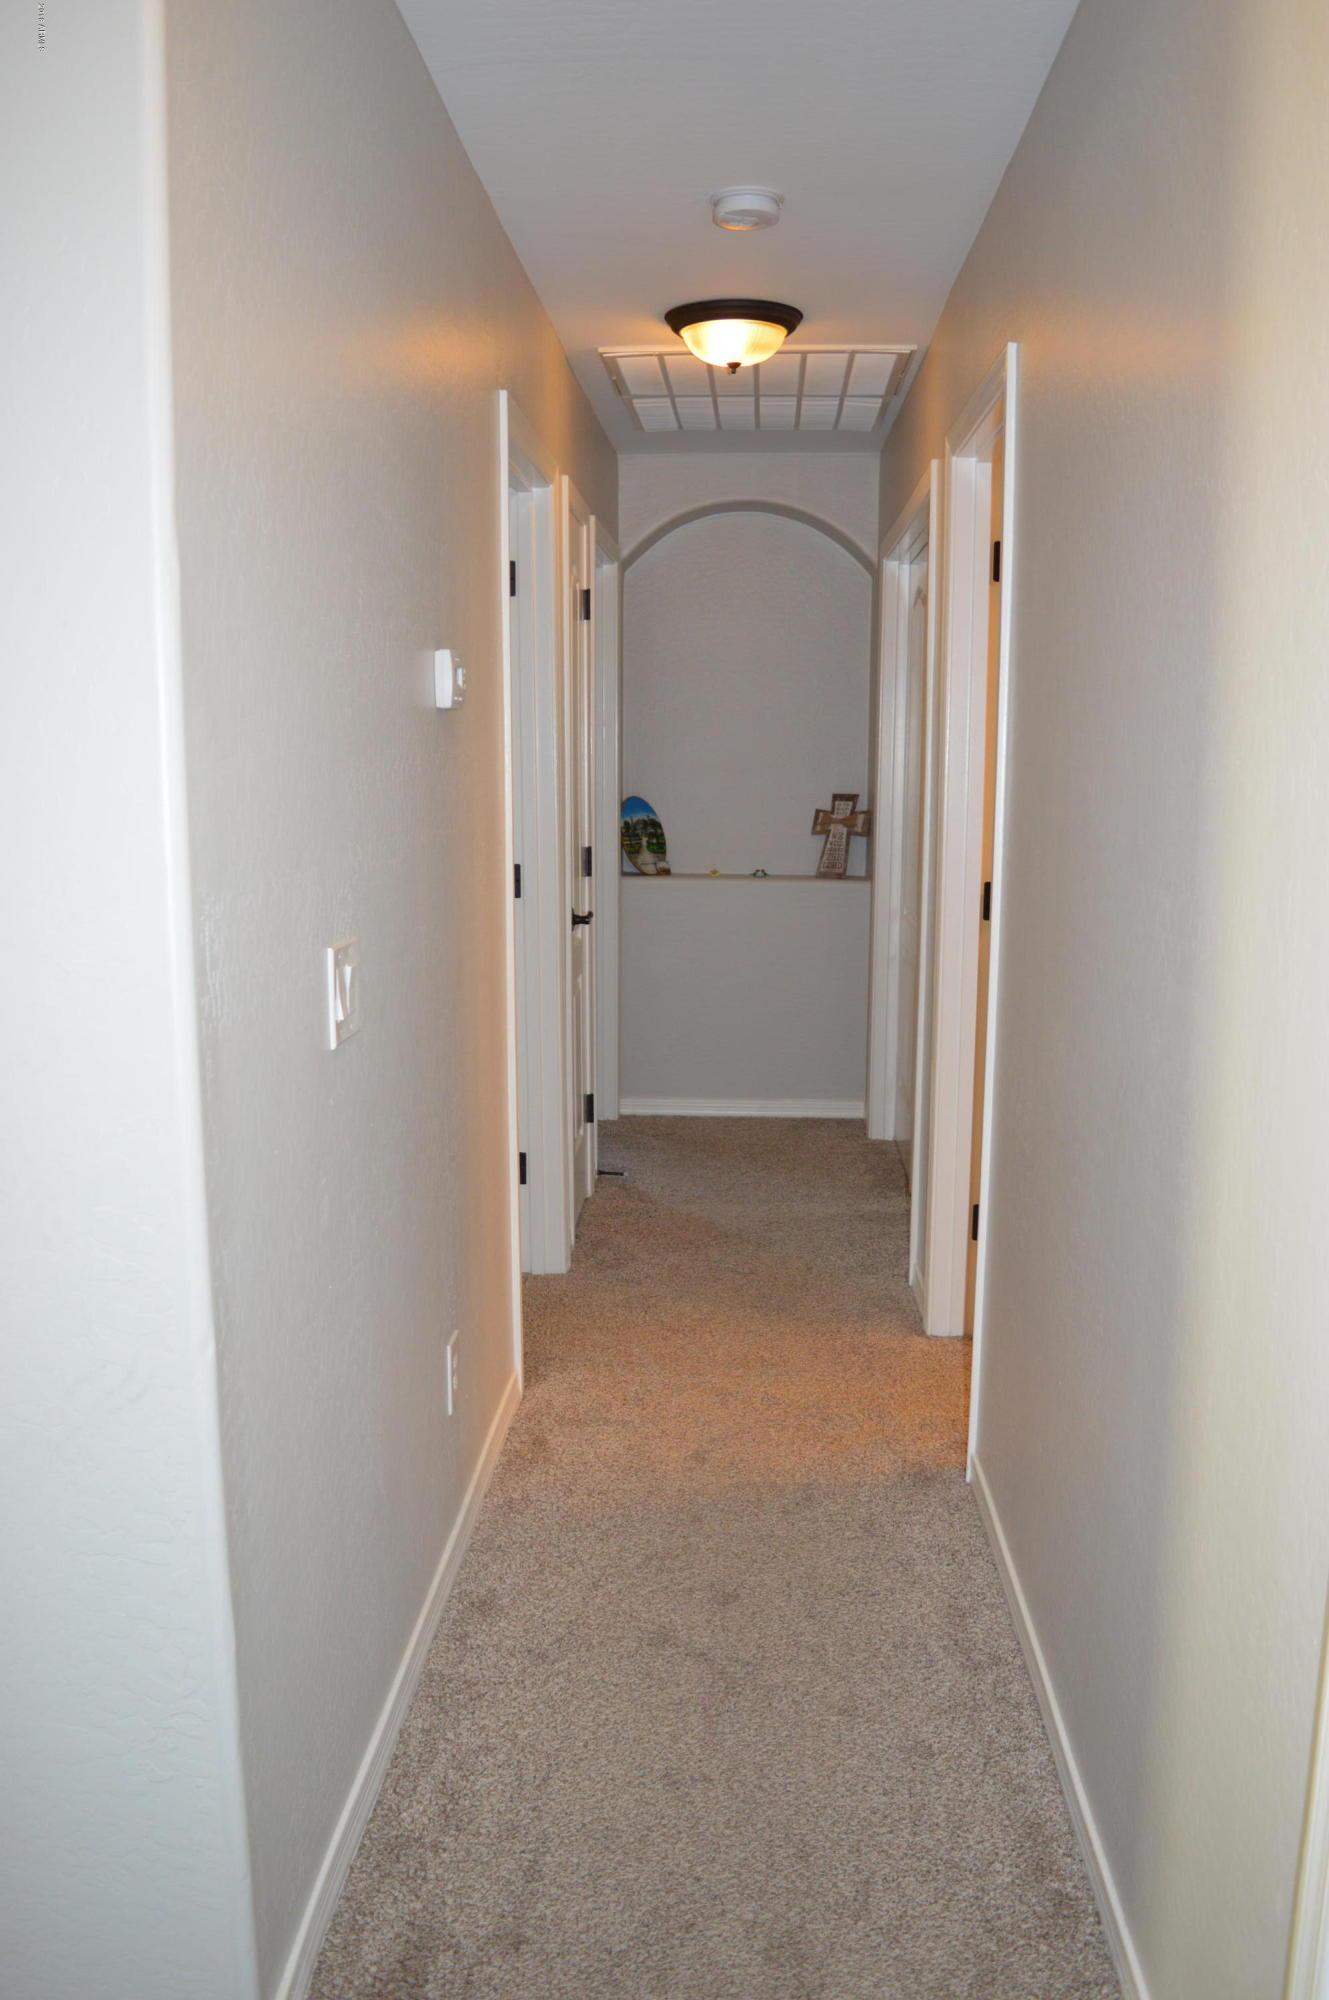 950 S WALLRADE Lane Gilbert, AZ 85296 - MLS #: 5853851